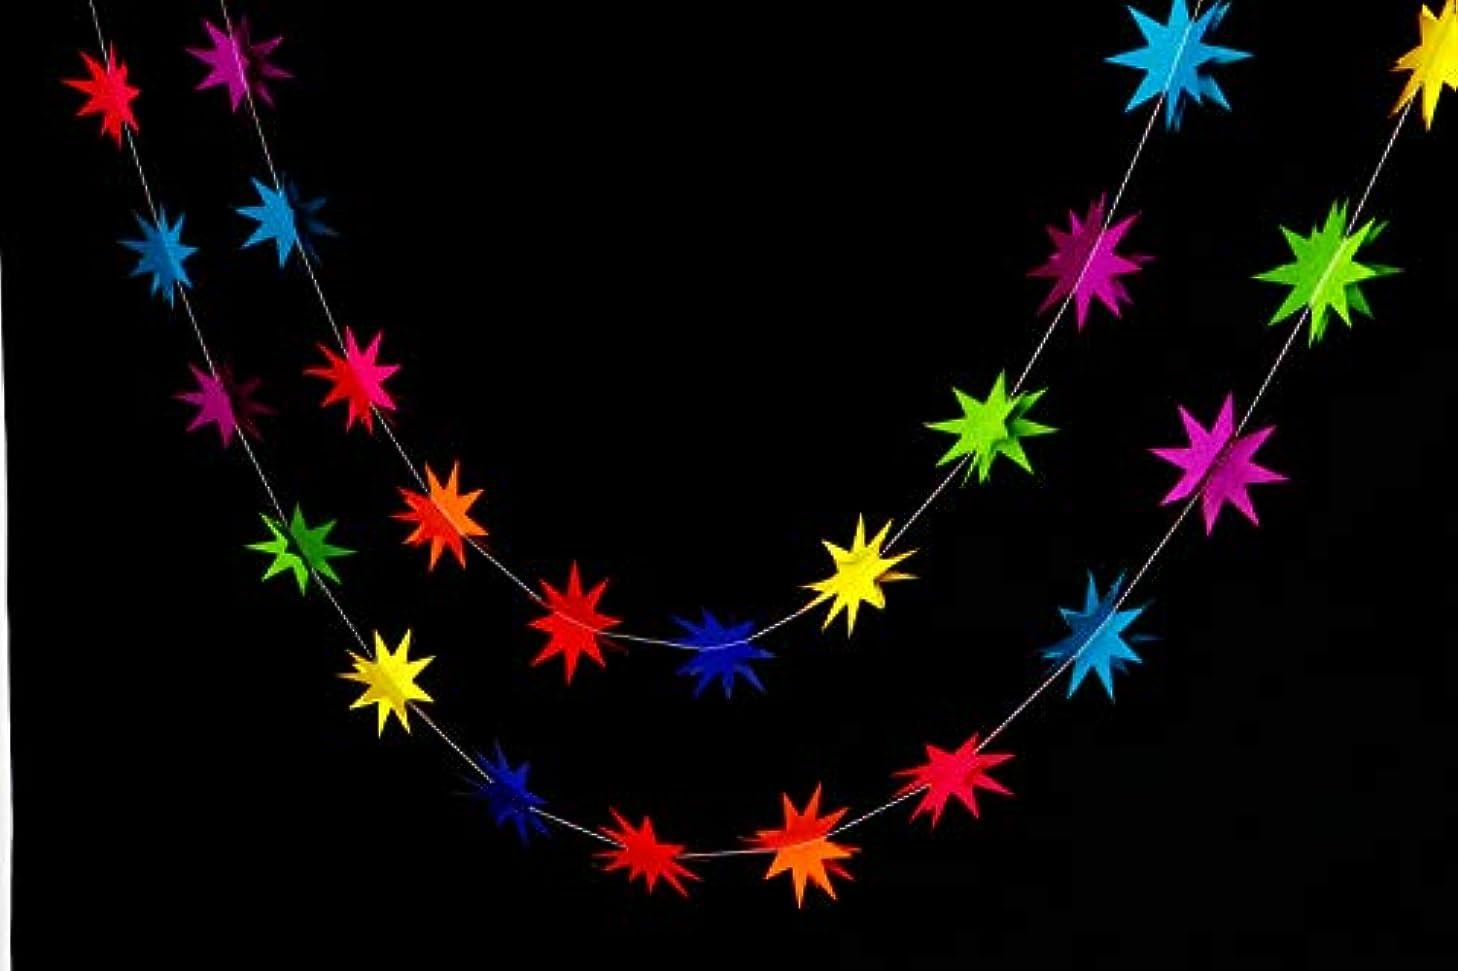 Rainbow Star(8Corner) 10ft Paper Garland, Birthday Party Decor, Wedding Shower Decor, Nursery Décor